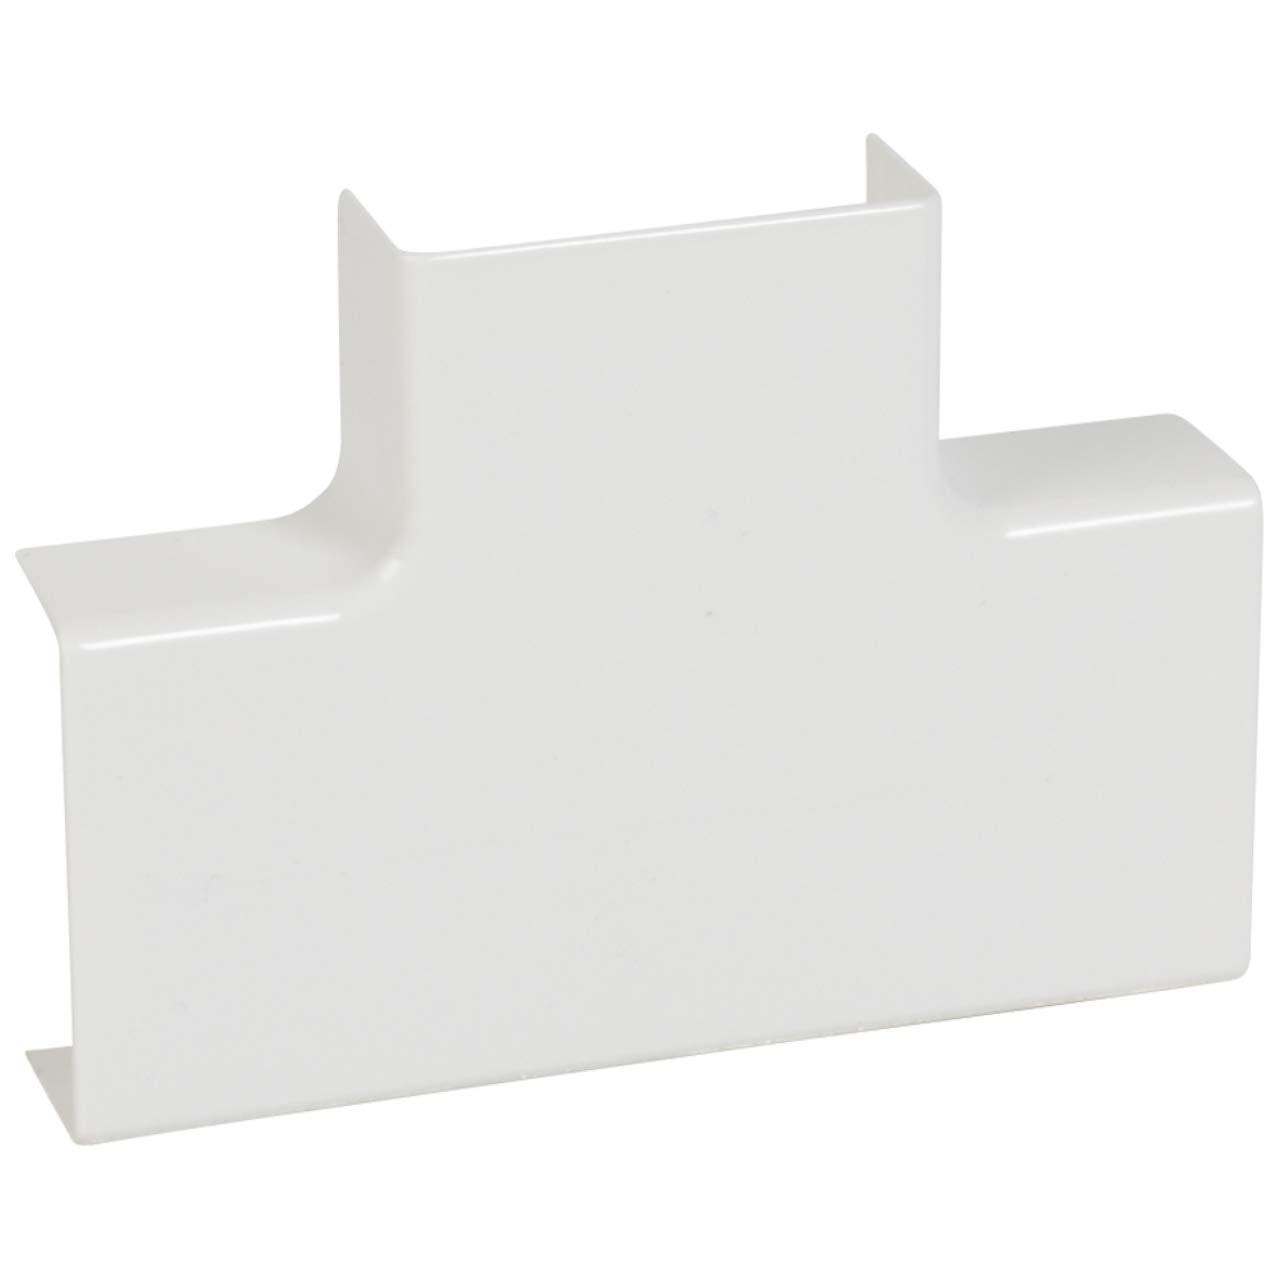 Legrand minican.//mold.dlplus Angulo plano variable dlplus 40x16mm pvc